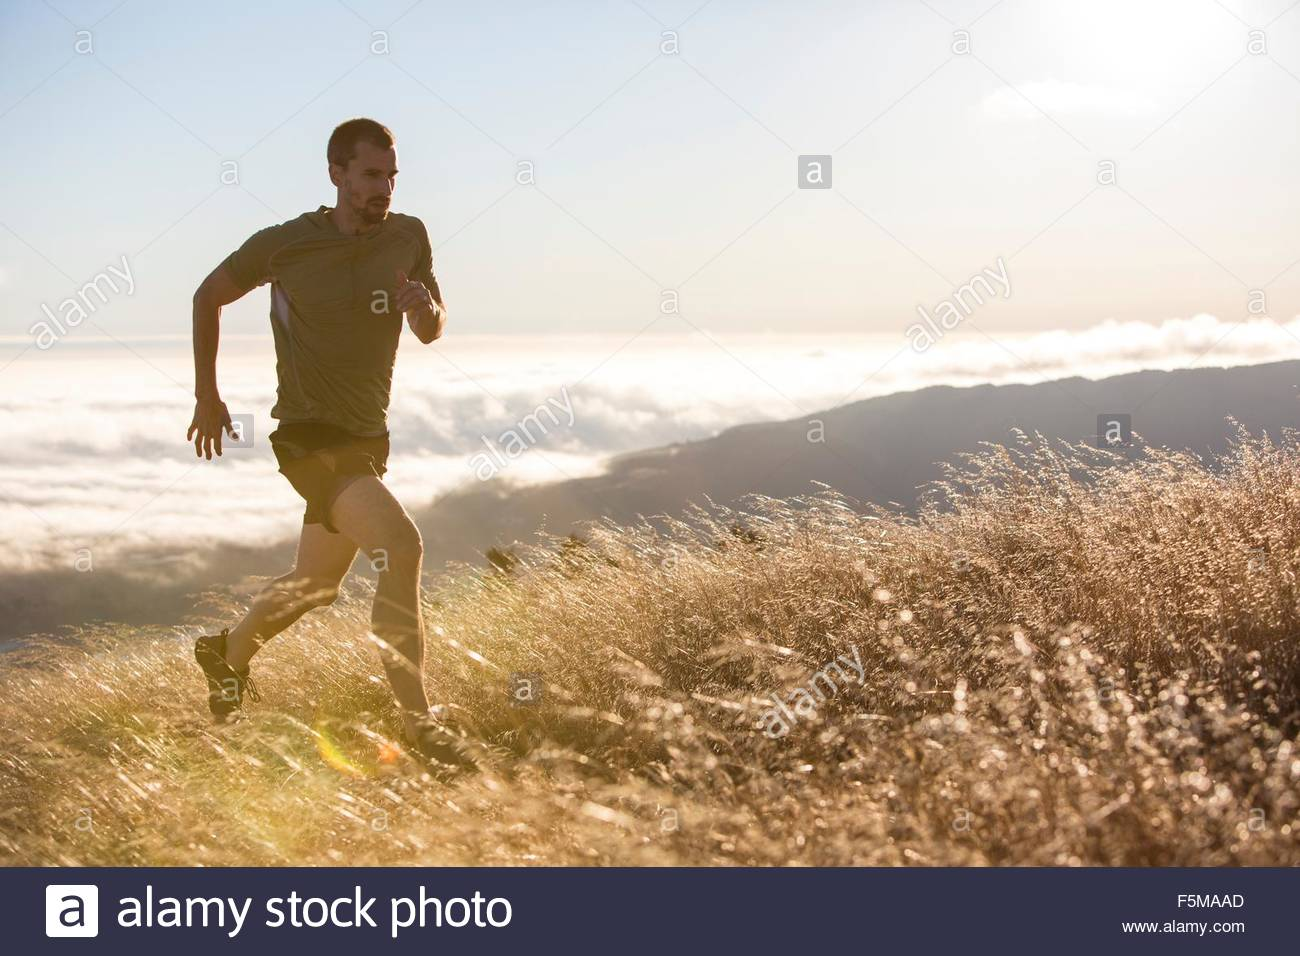 L'homme en marche, mer en arrière-plan, Marin, en Californie, USA Photo Stock